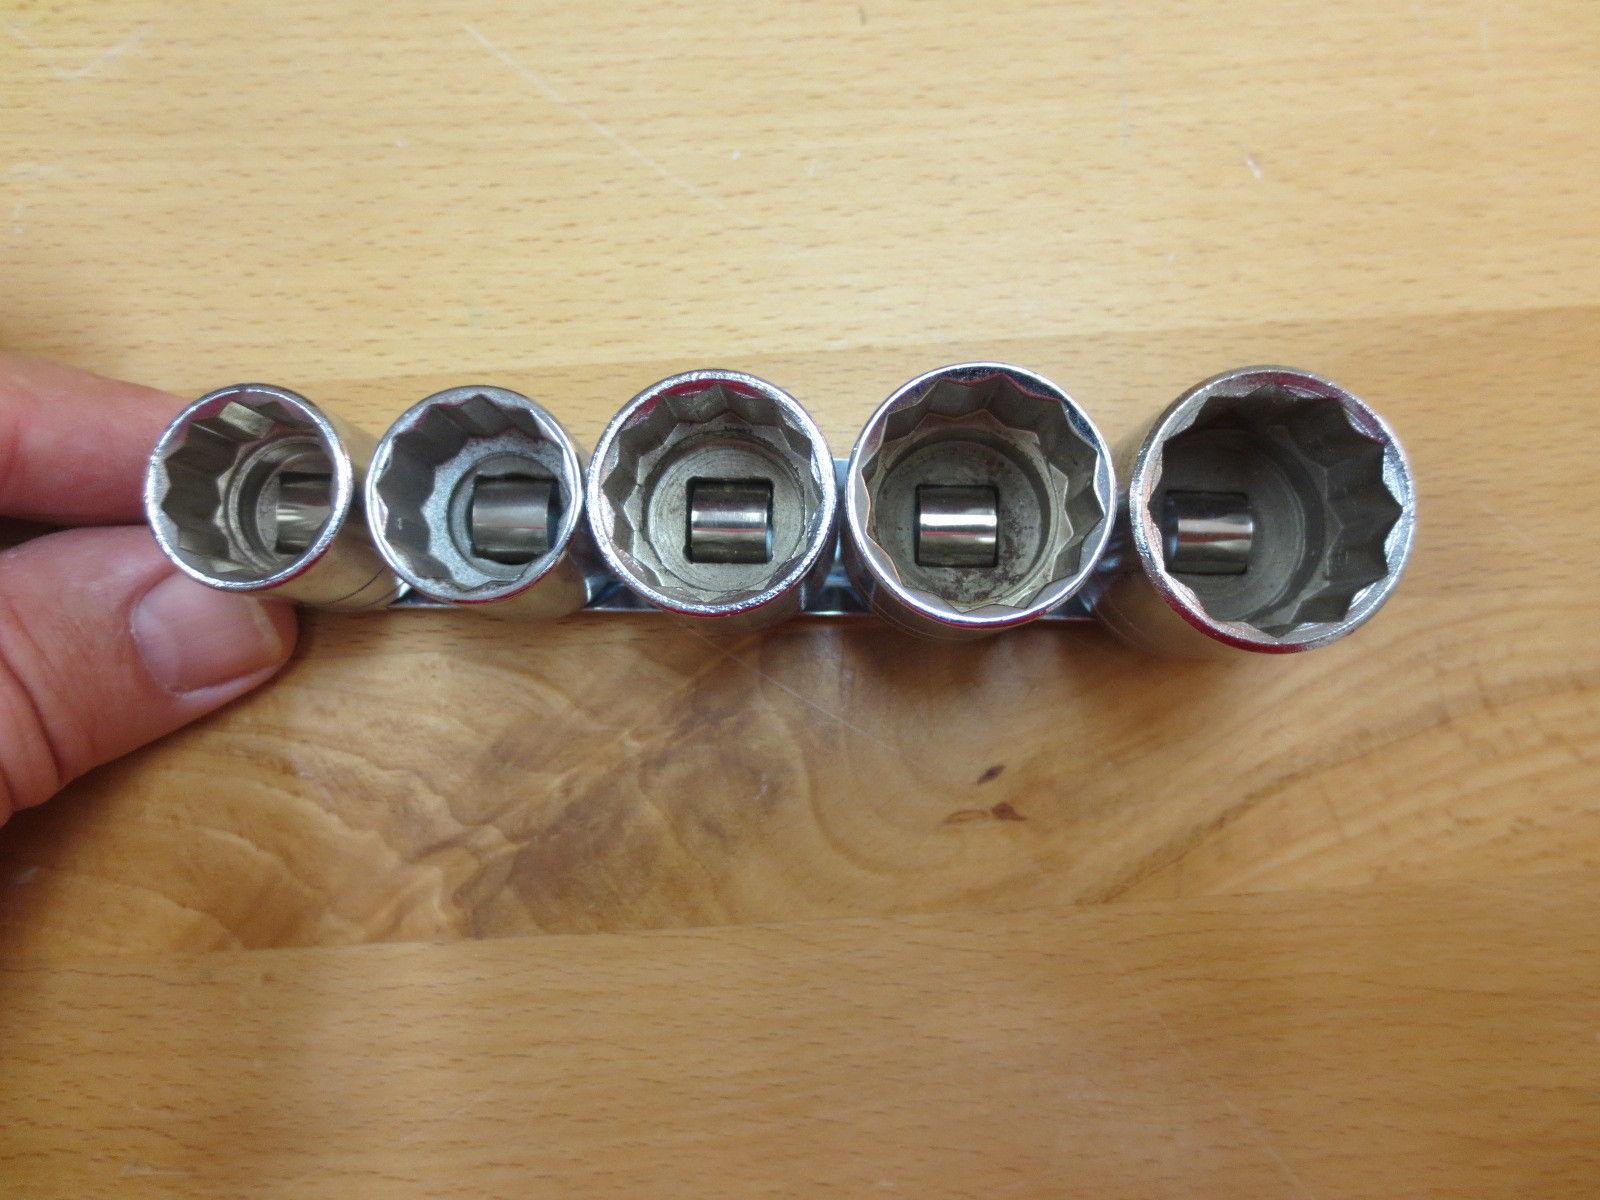 "SK 3885 5 Pc., 3/8"" Drive, SAE Socket Set, Standard Depth, 5/8-7/8, USA!"